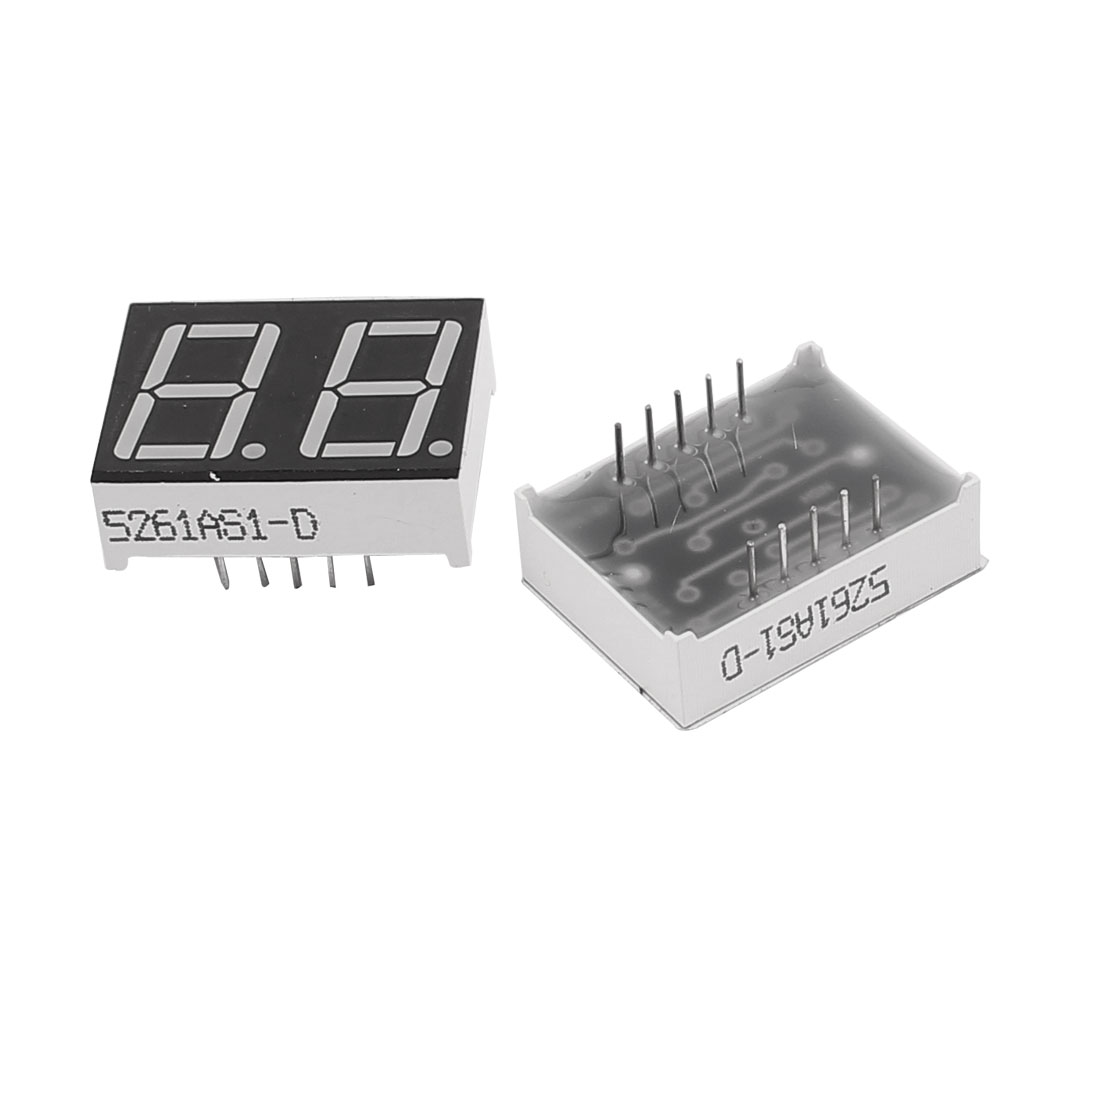 "2 Pcs Common Cathode 10 Pin 2 Bit 7 Segment 0.56"" Red LED Display Digital Tube"